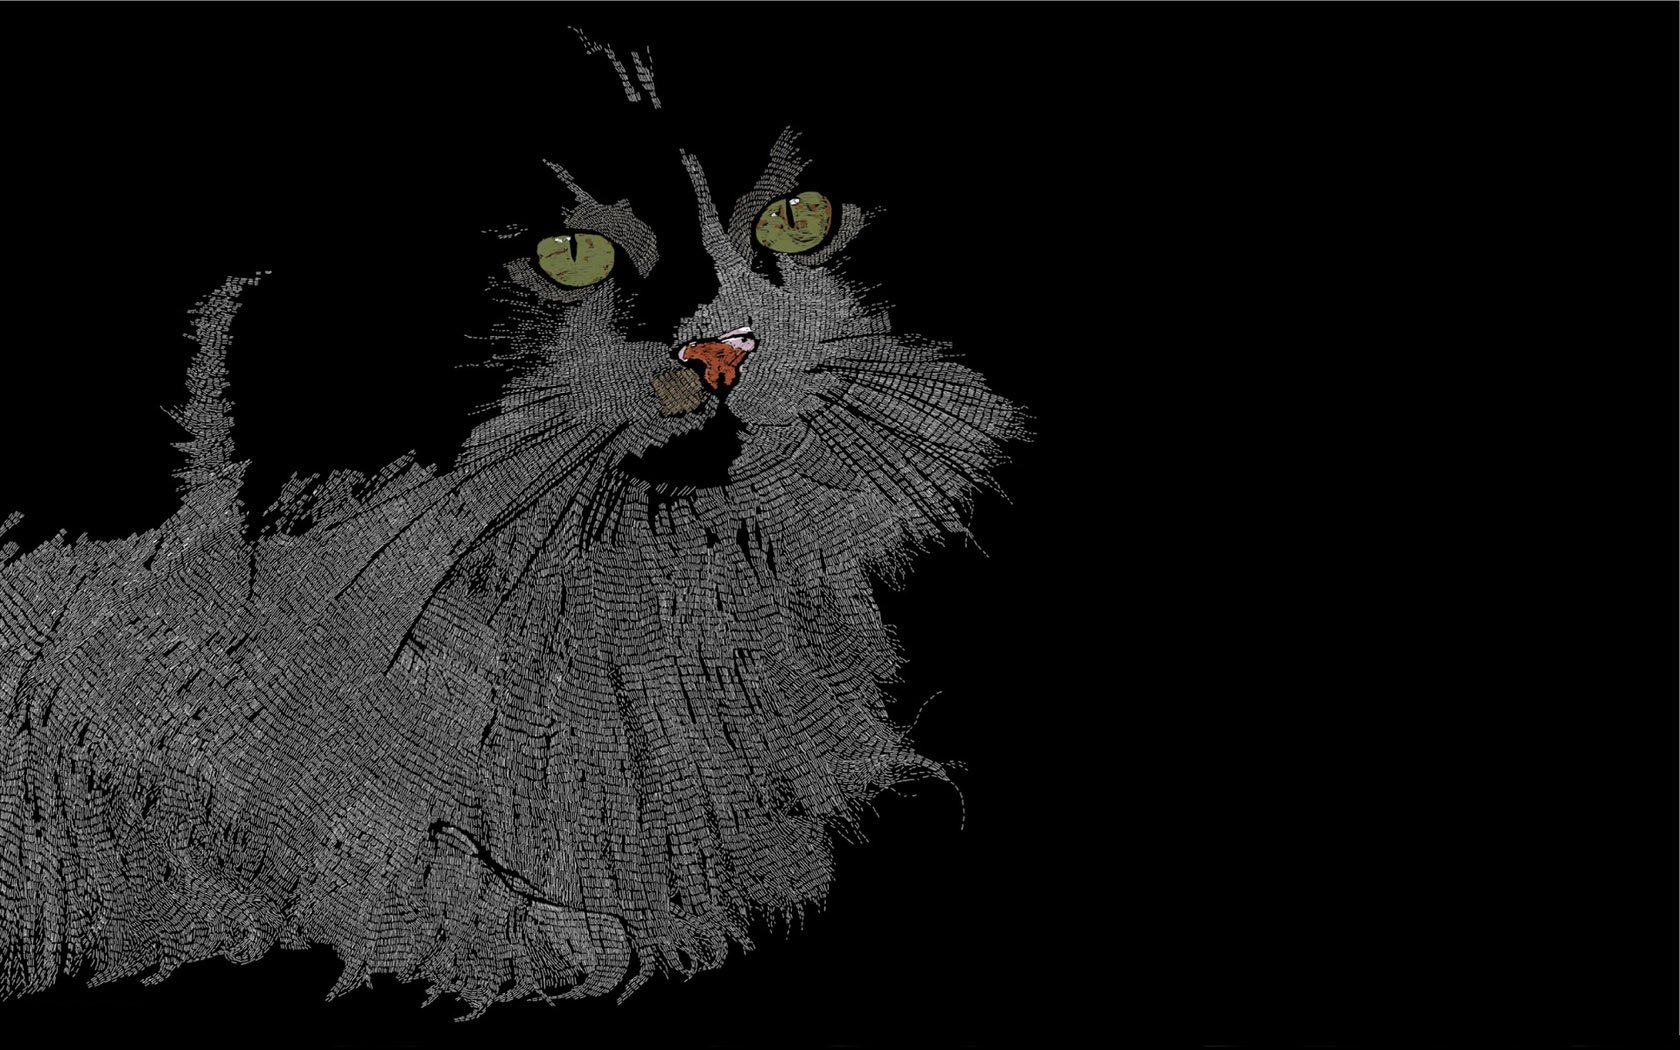 47 animated cat wallpaper for desktop on wallpapersafari - Cartoon cat background ...